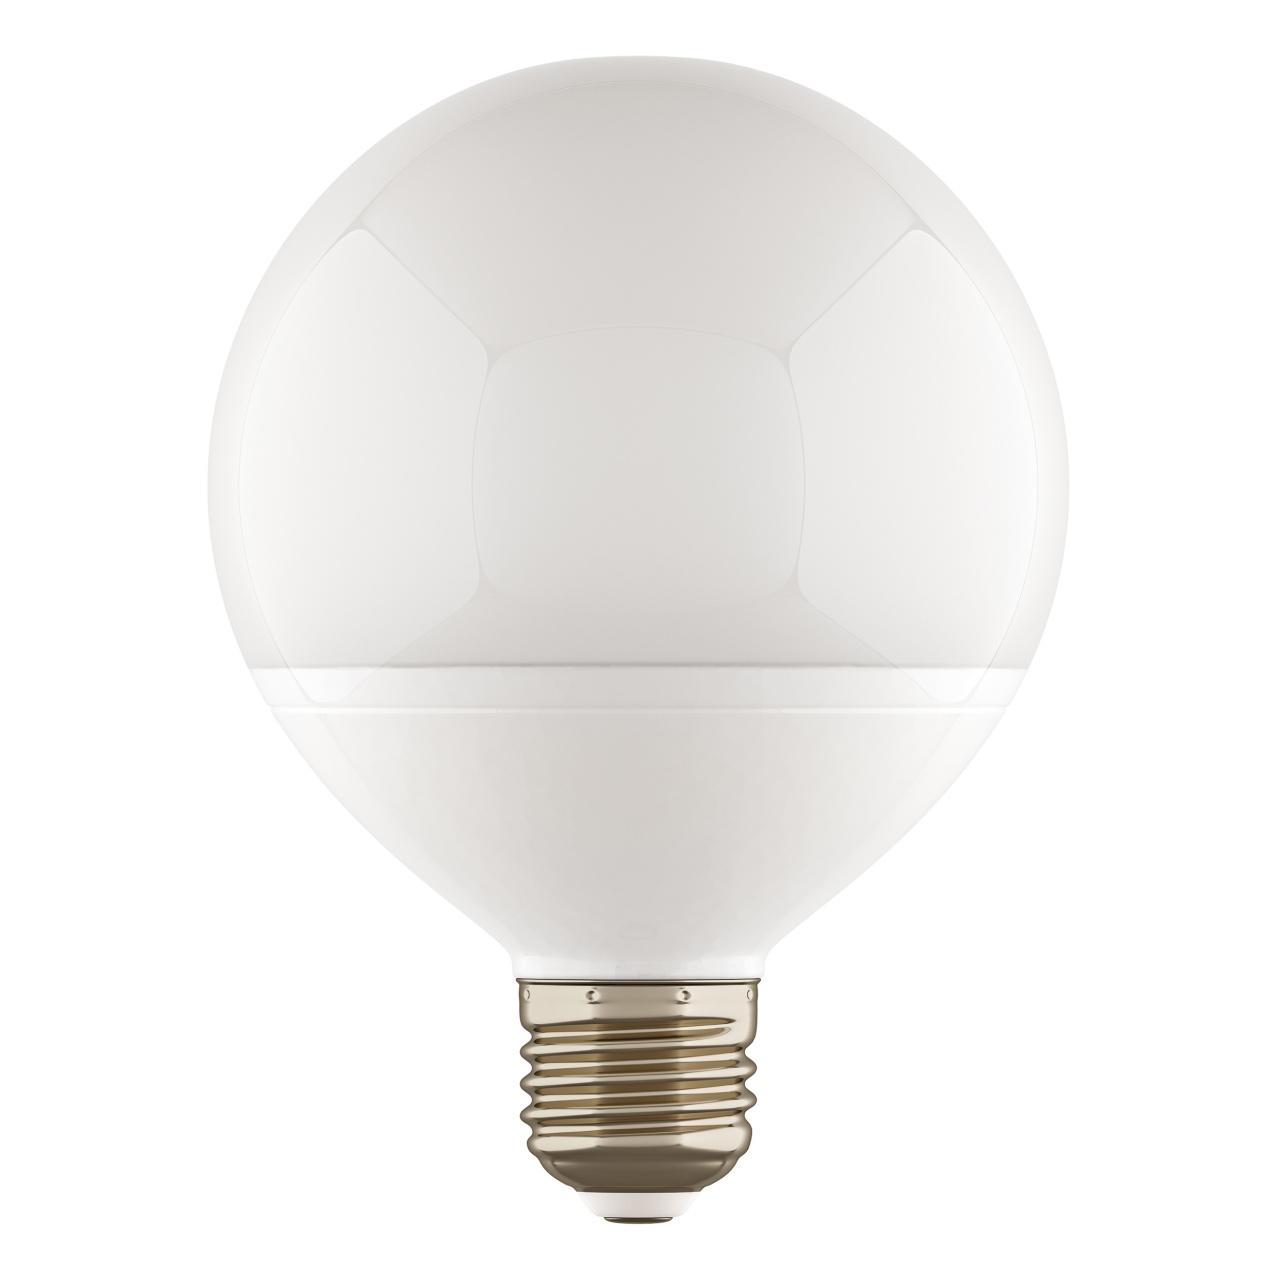 Лампа LED 220V G95 E27 13W=130W 1100LM 180G FR 3000K 20000H Lightstar 930312